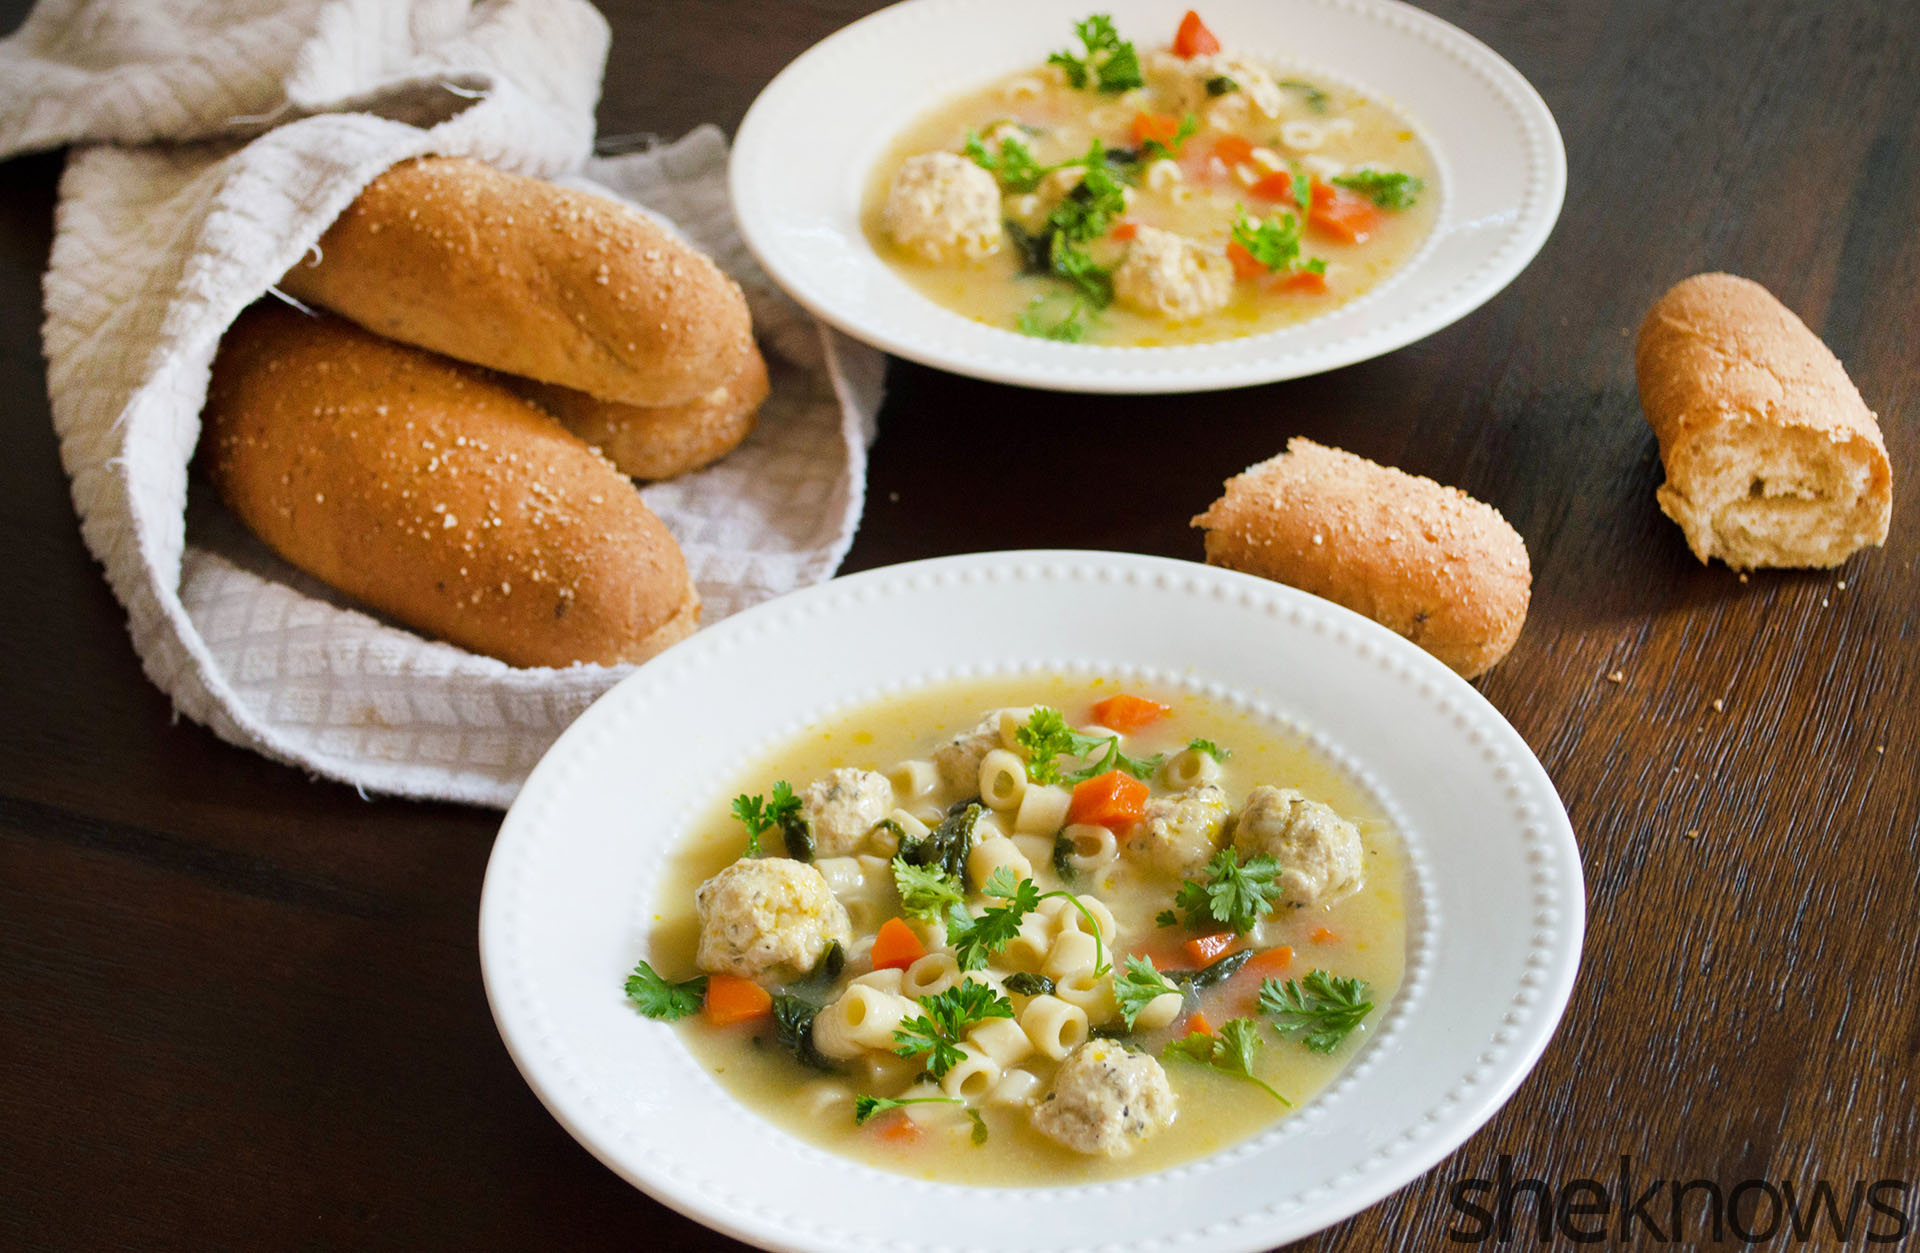 Slow Cooker Sunday Effortless Homemade Italian Wedding Soup